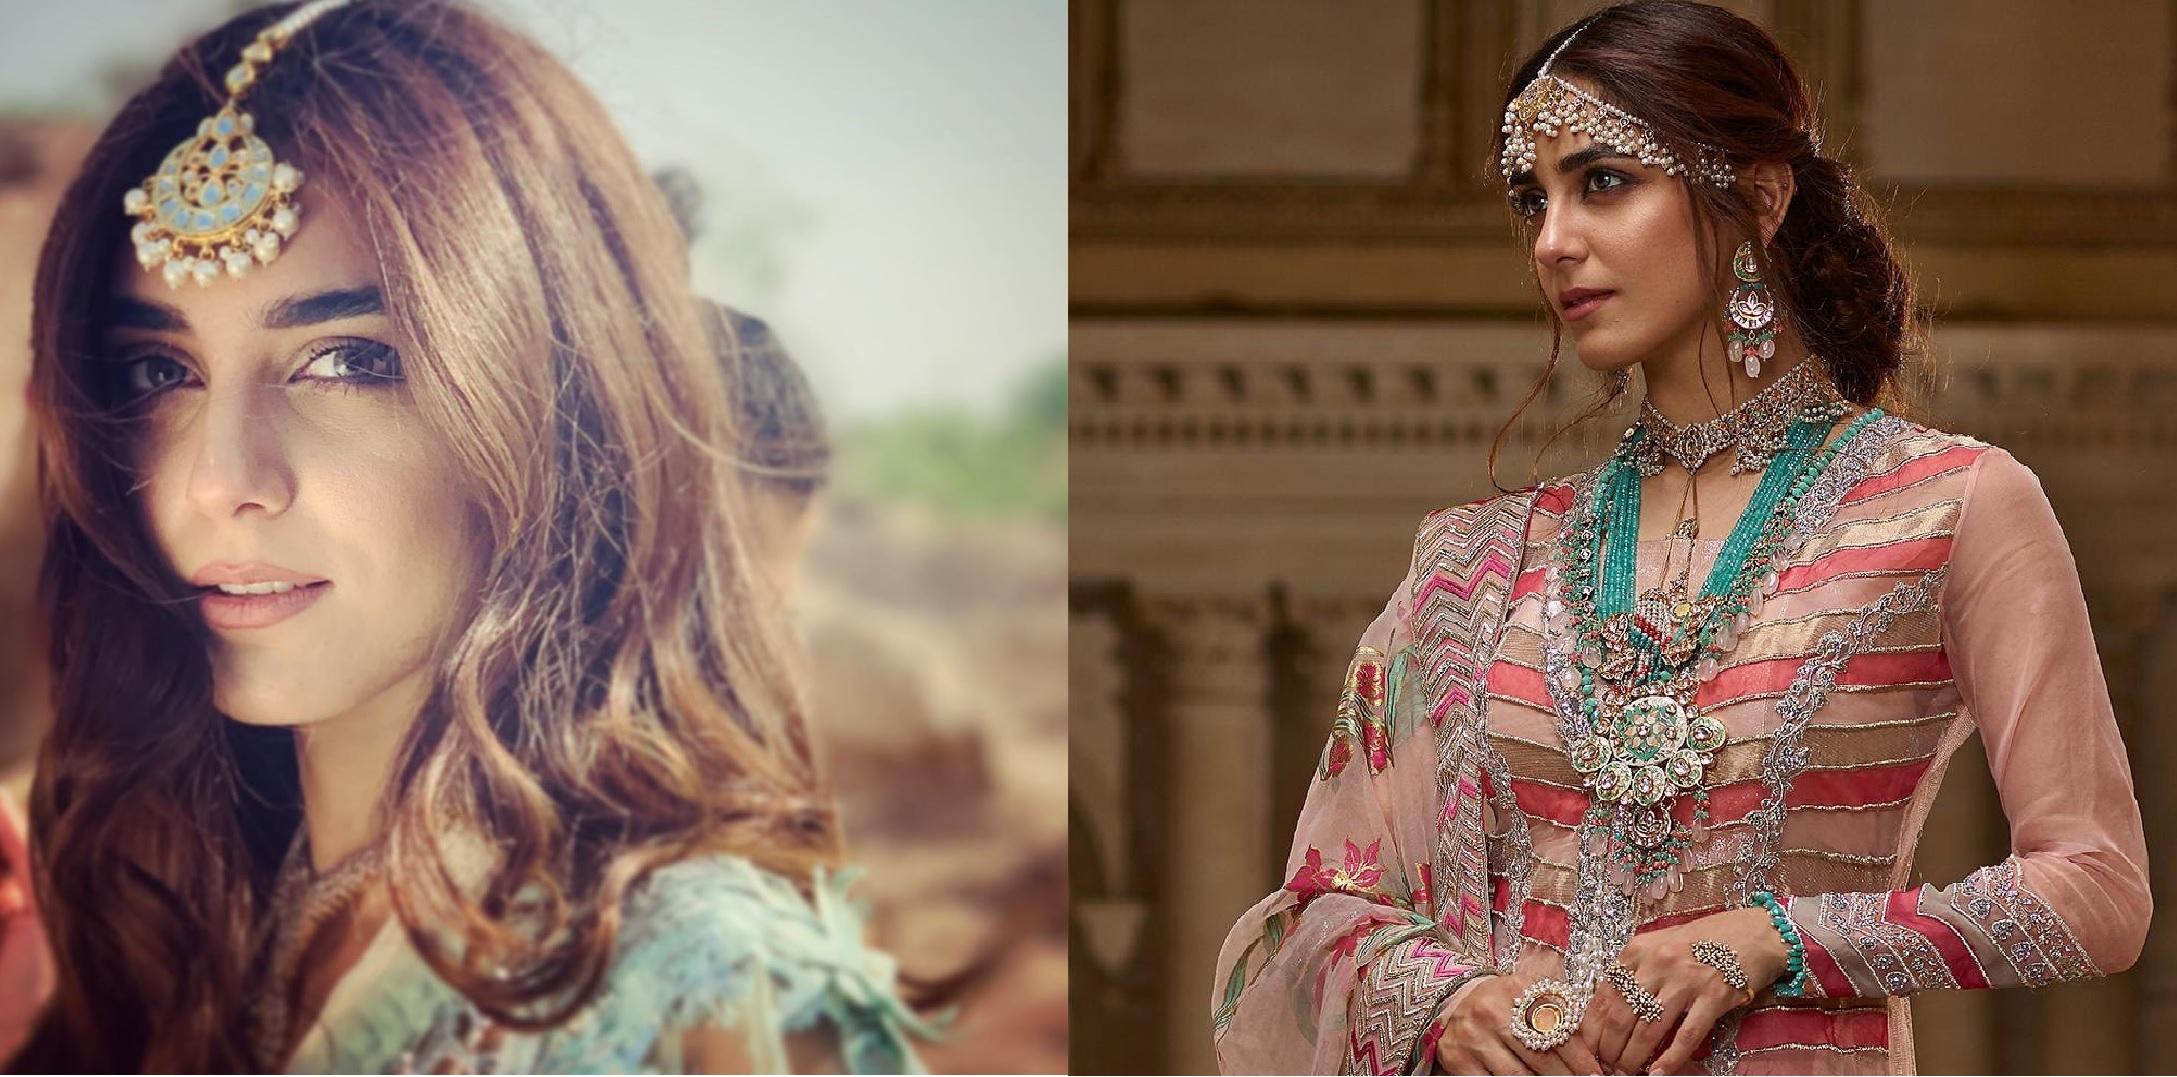 Maya Ali Famous Pakistani Actress Latest Shoot In Bridal Dresses (1)